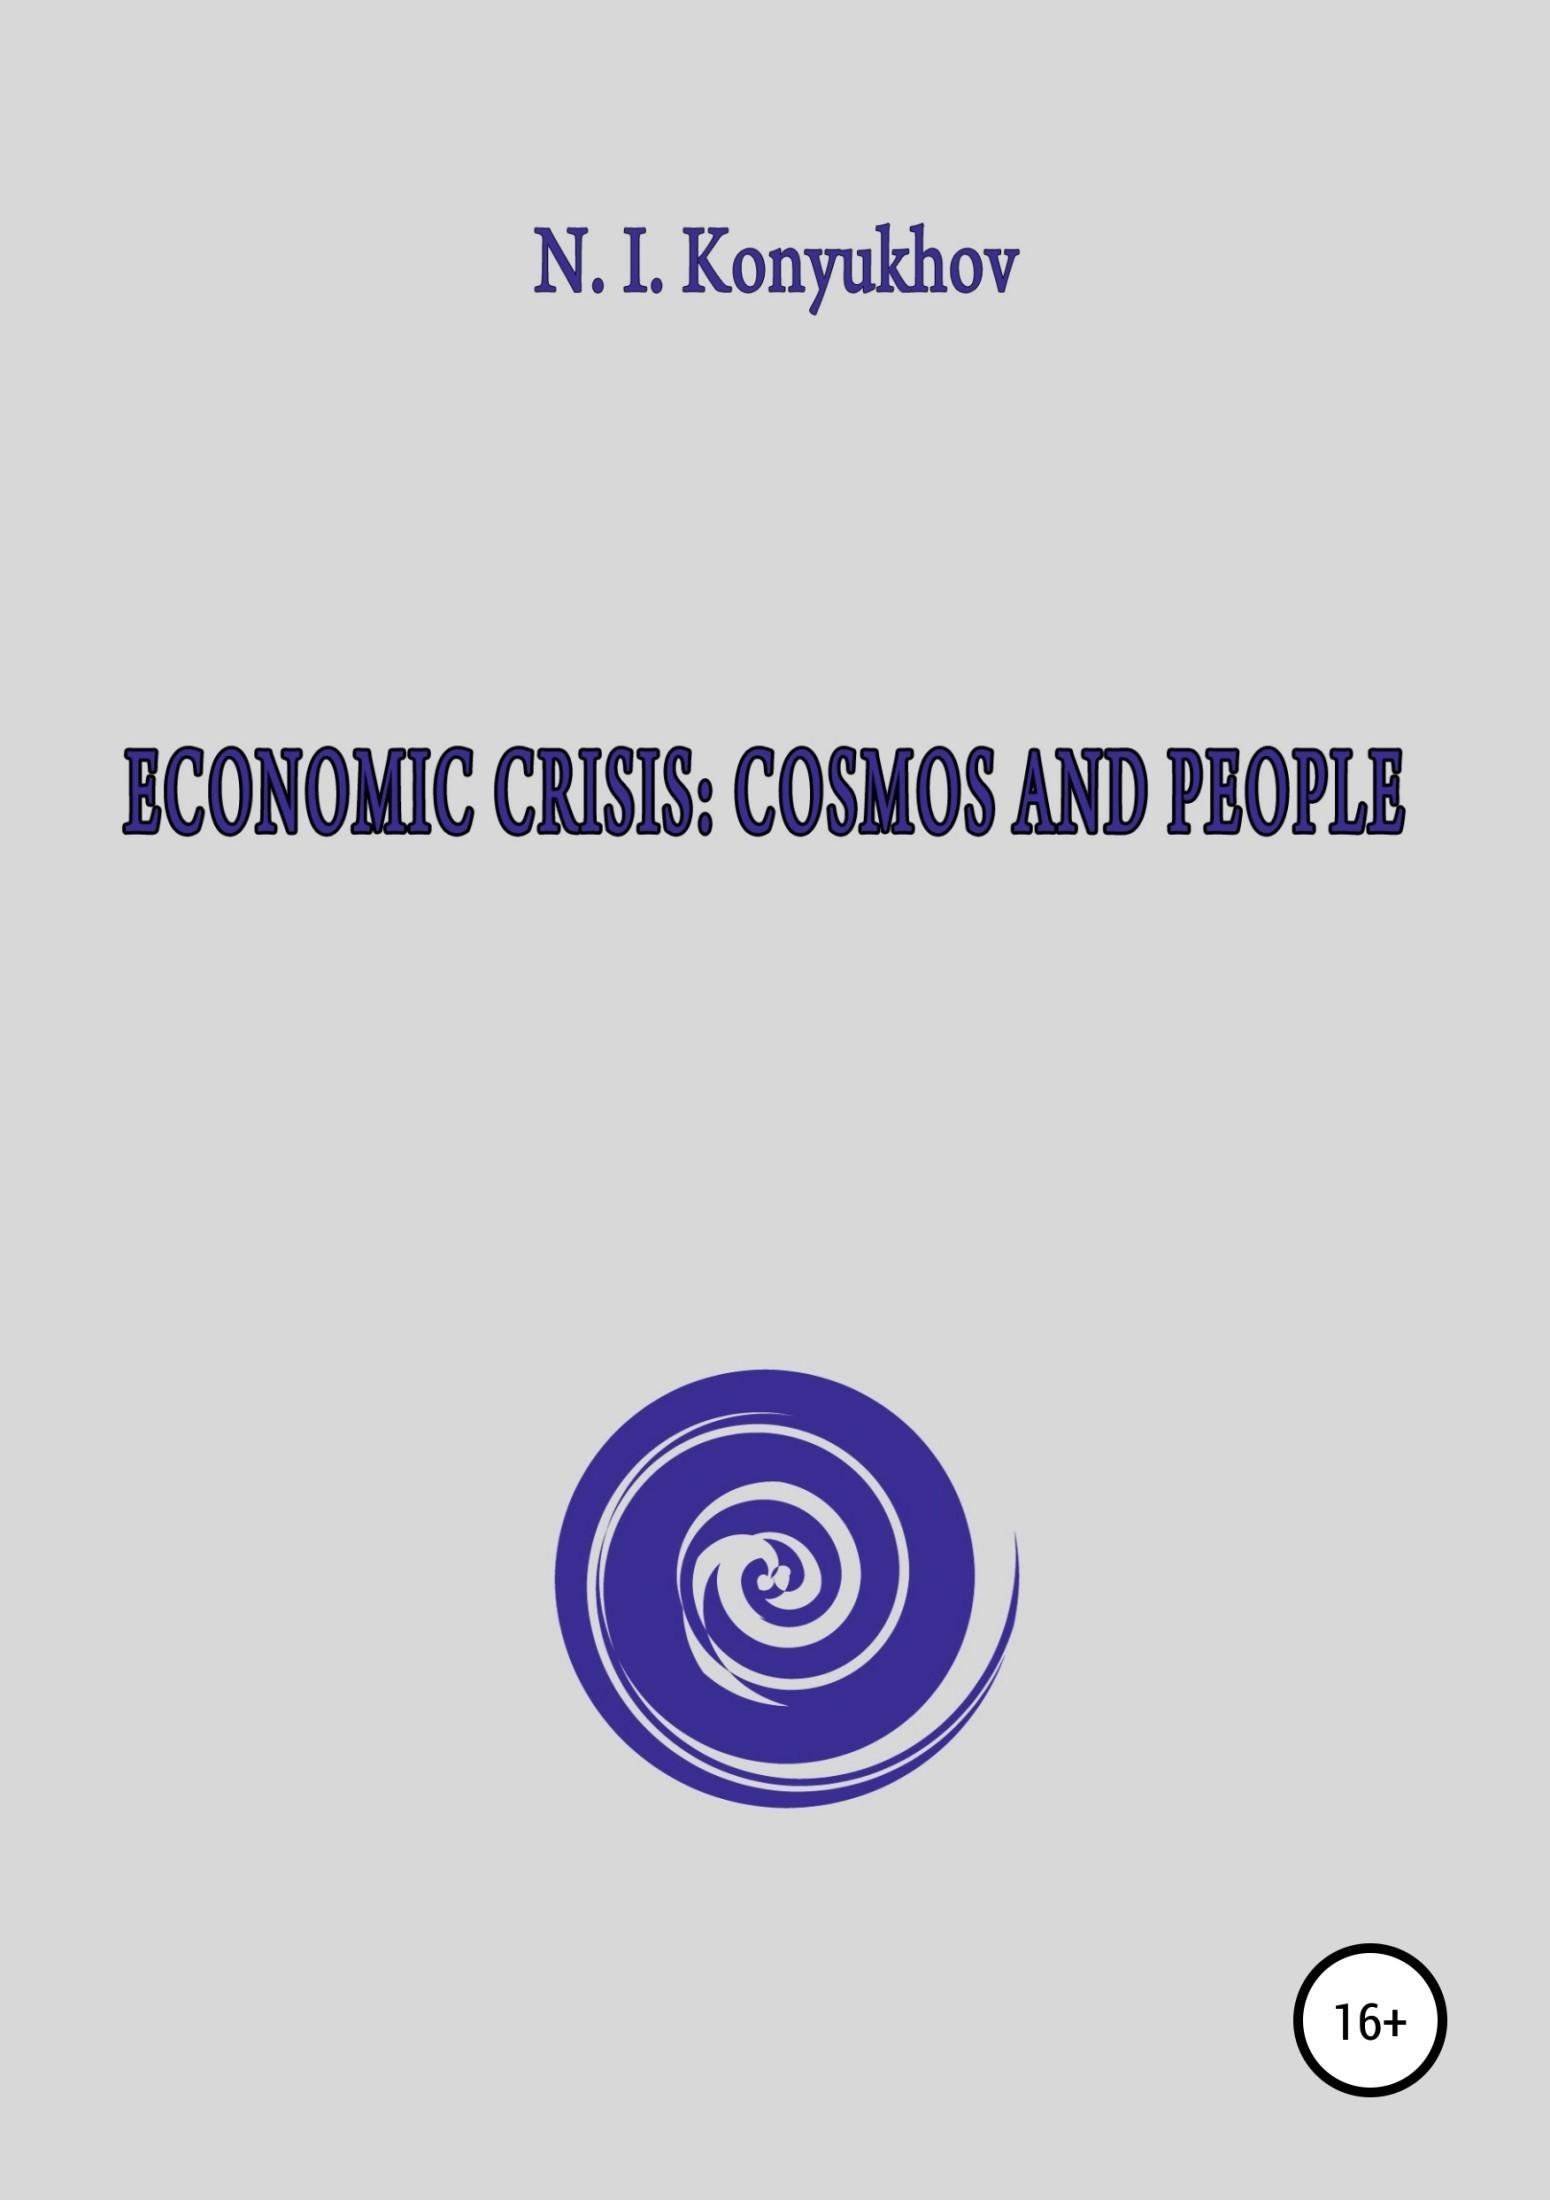 Economic crisis: Cosmos and people